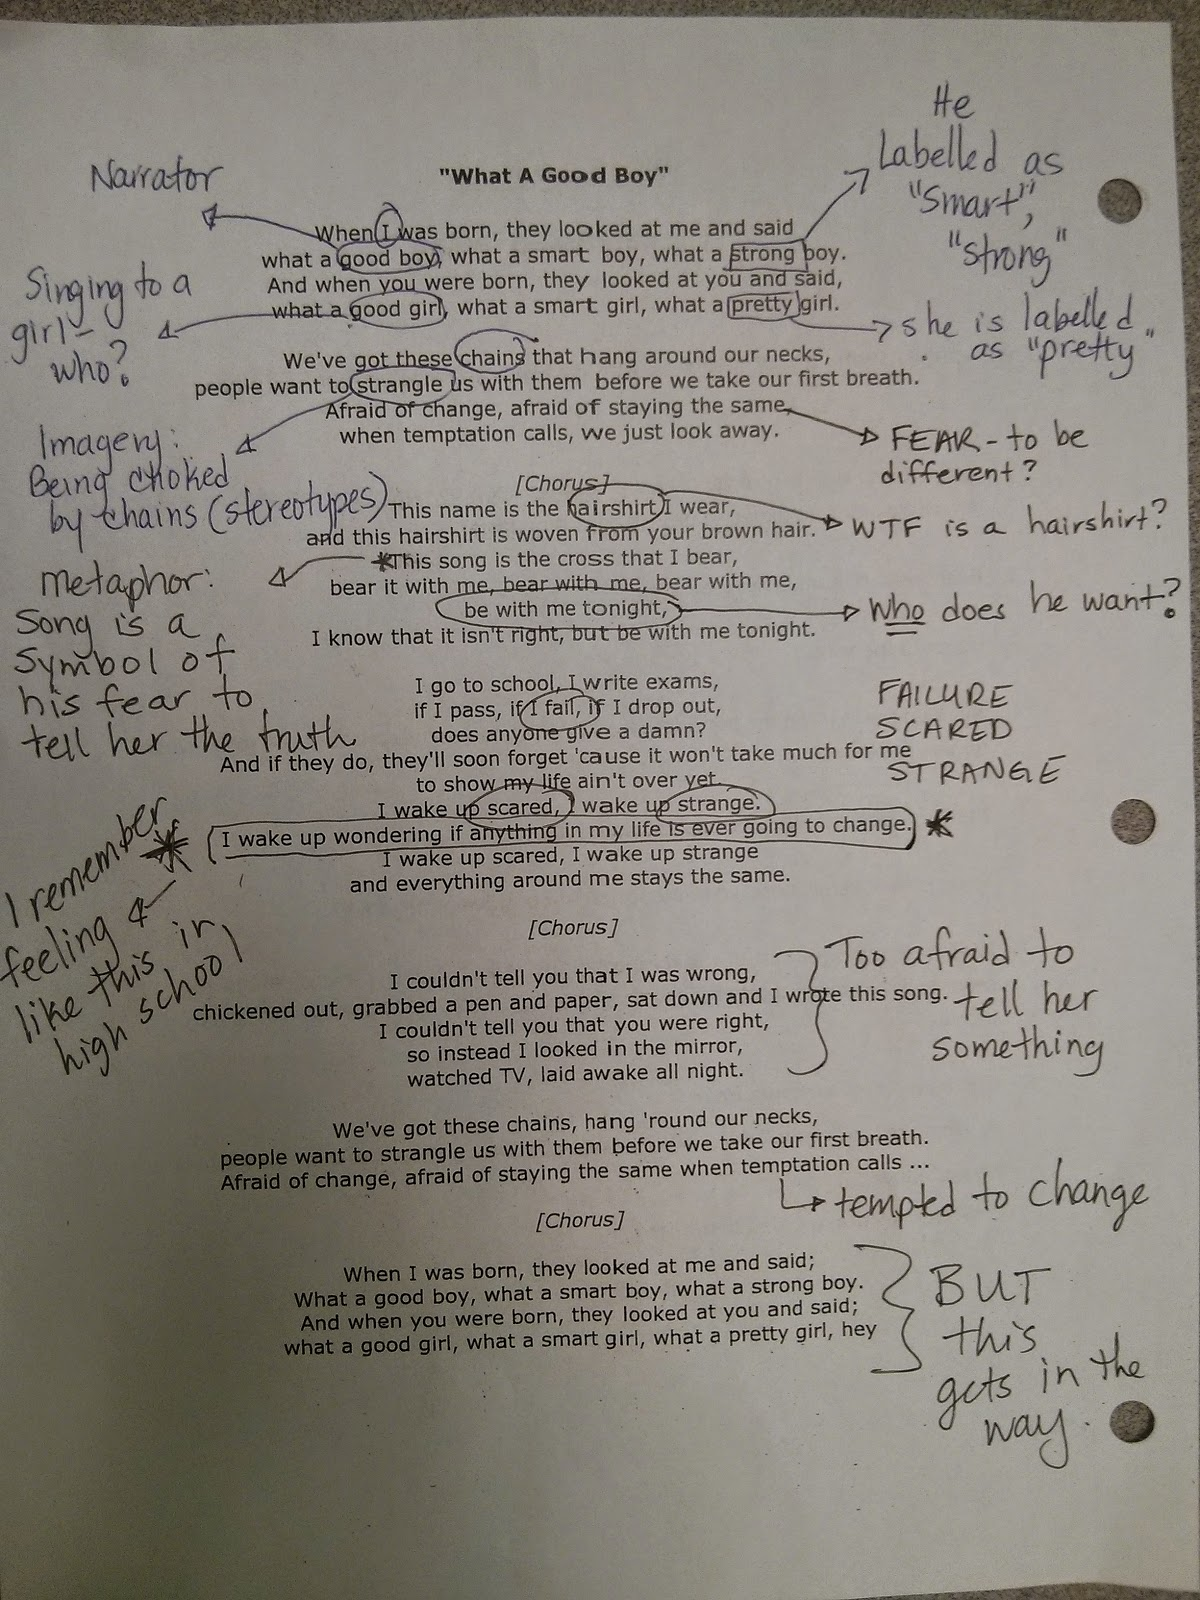 cpm homework help algebra  cpm e tools mr montgomery buy essay online essay writing service write my essay